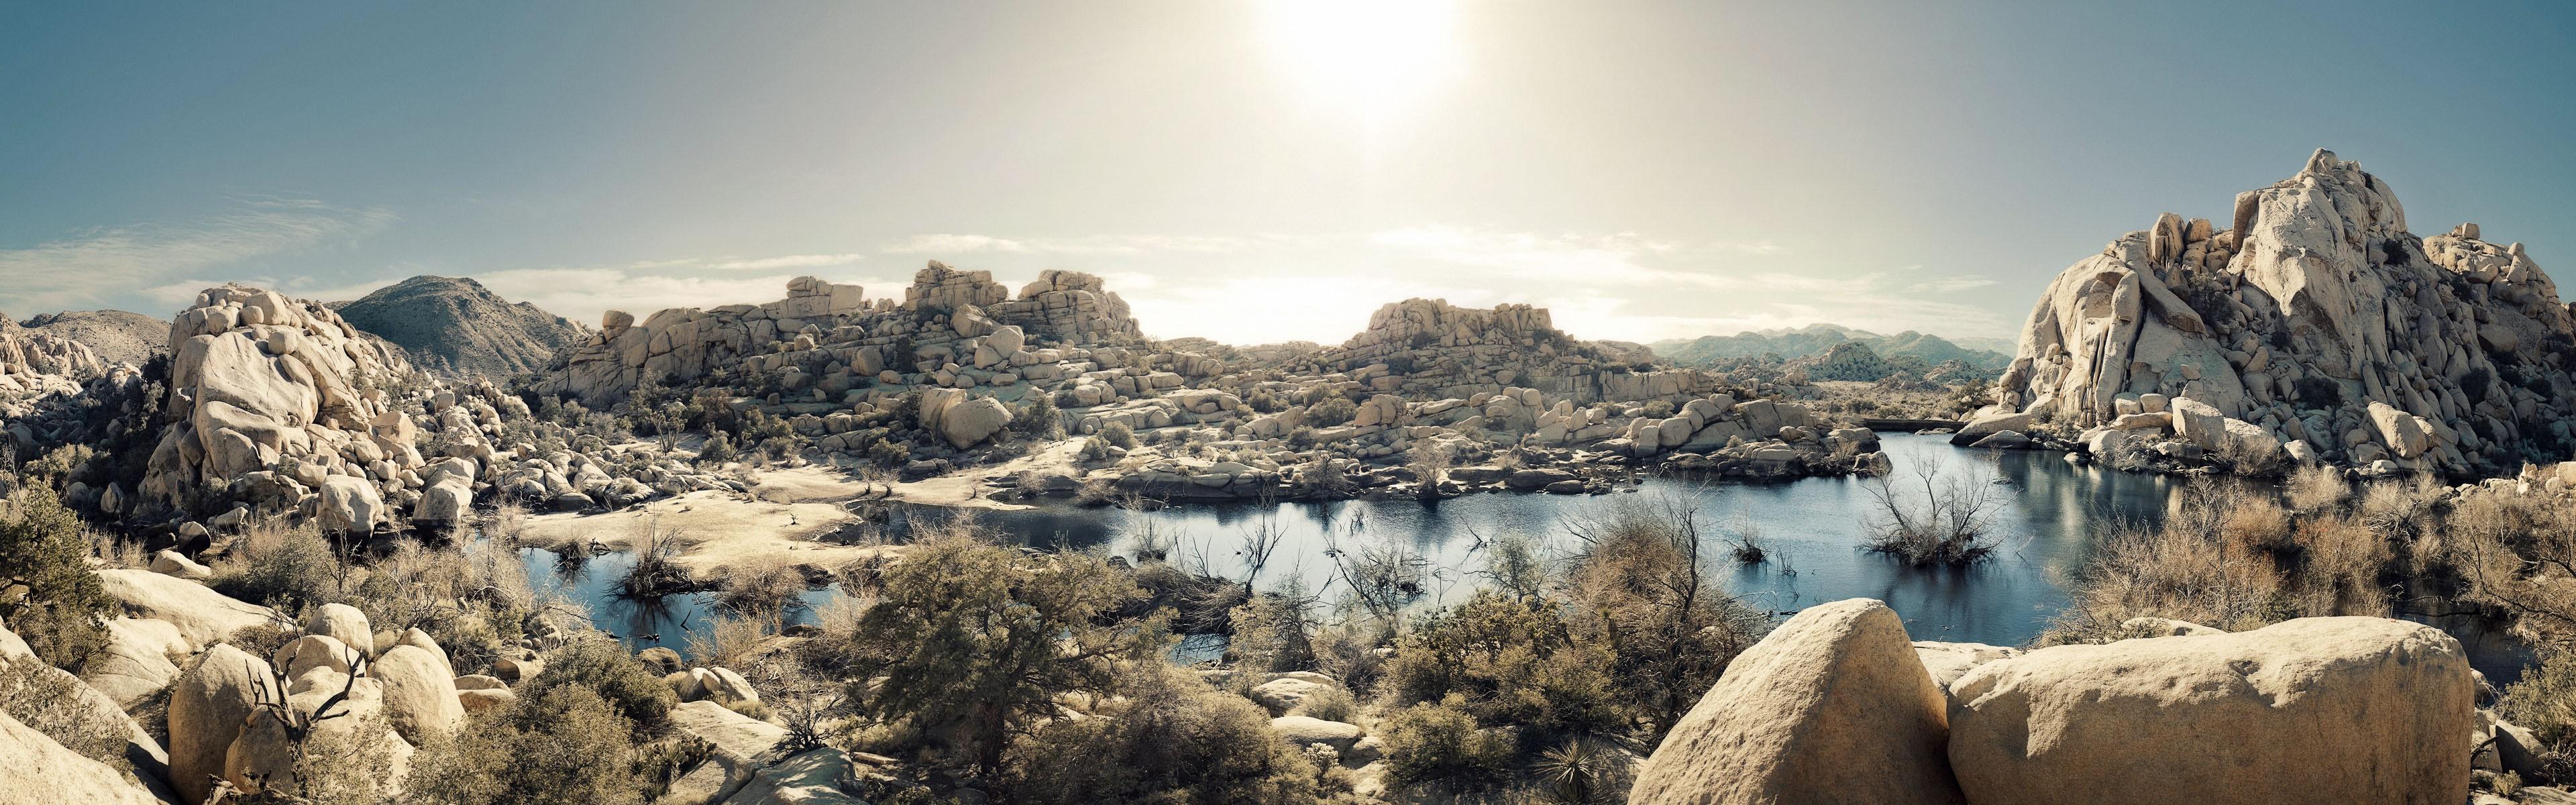 Cute Home Screen Wallpaper For Iphone Desert Rock Formations Lake National Park California Us